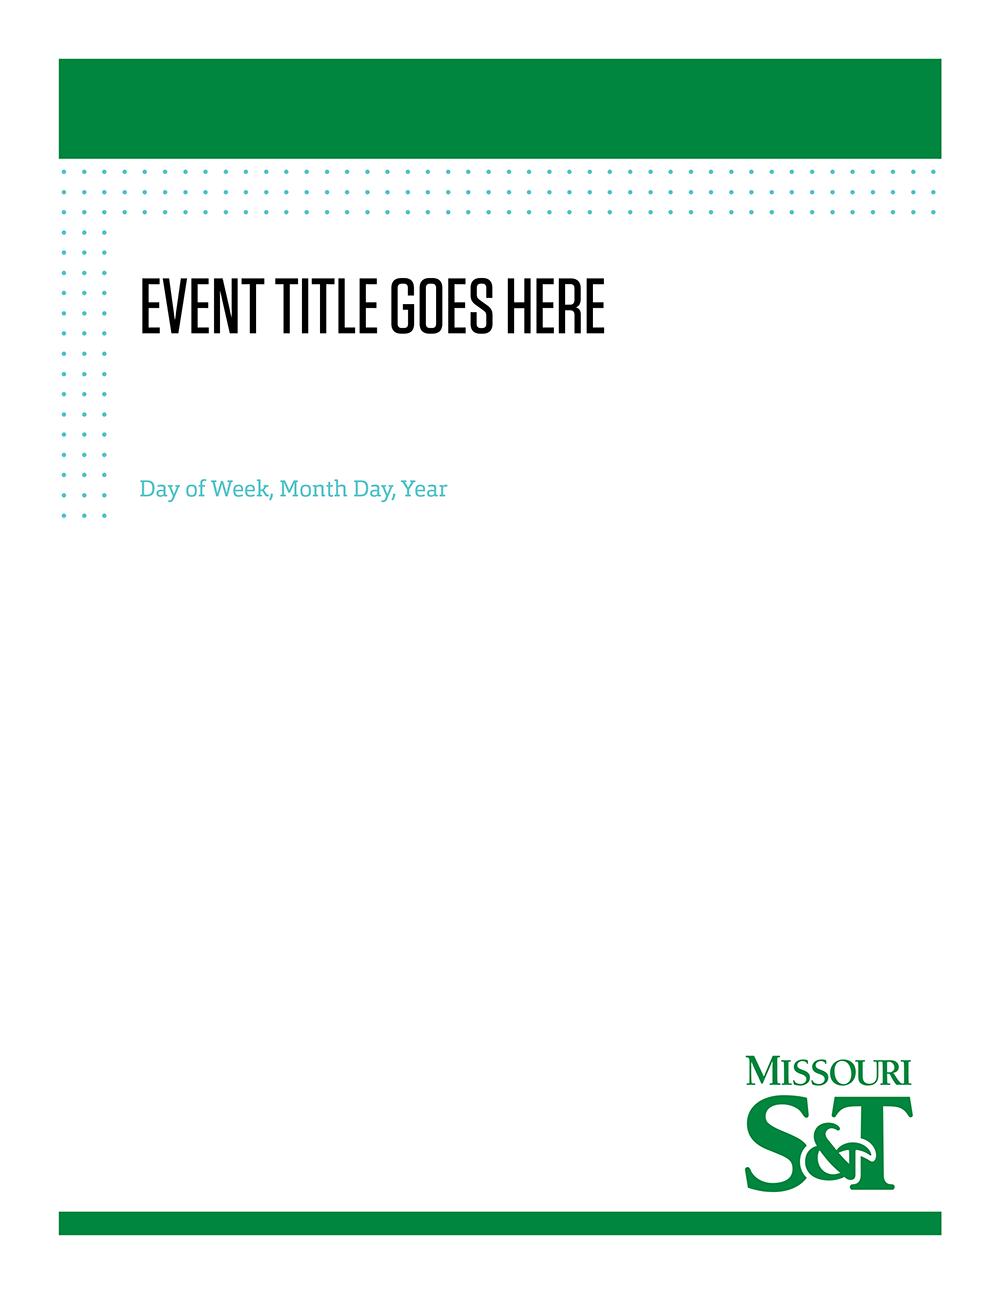 Print Templates – Marketing And Communications Missouri S&T